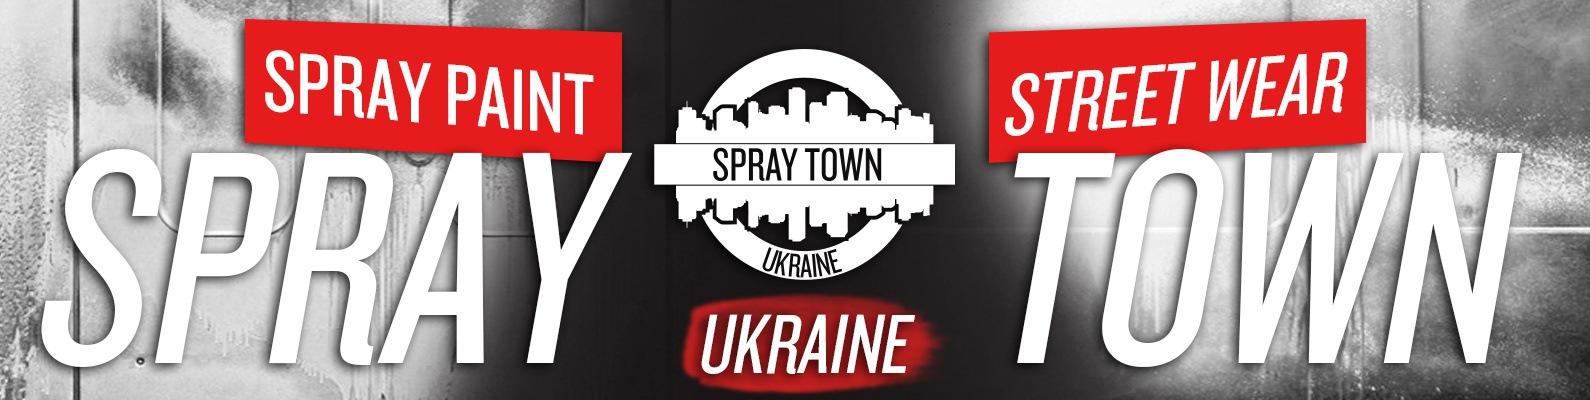 eadfcf0b Spray Town - граффити, одежда, кроссовки Украина | ВКонтакте